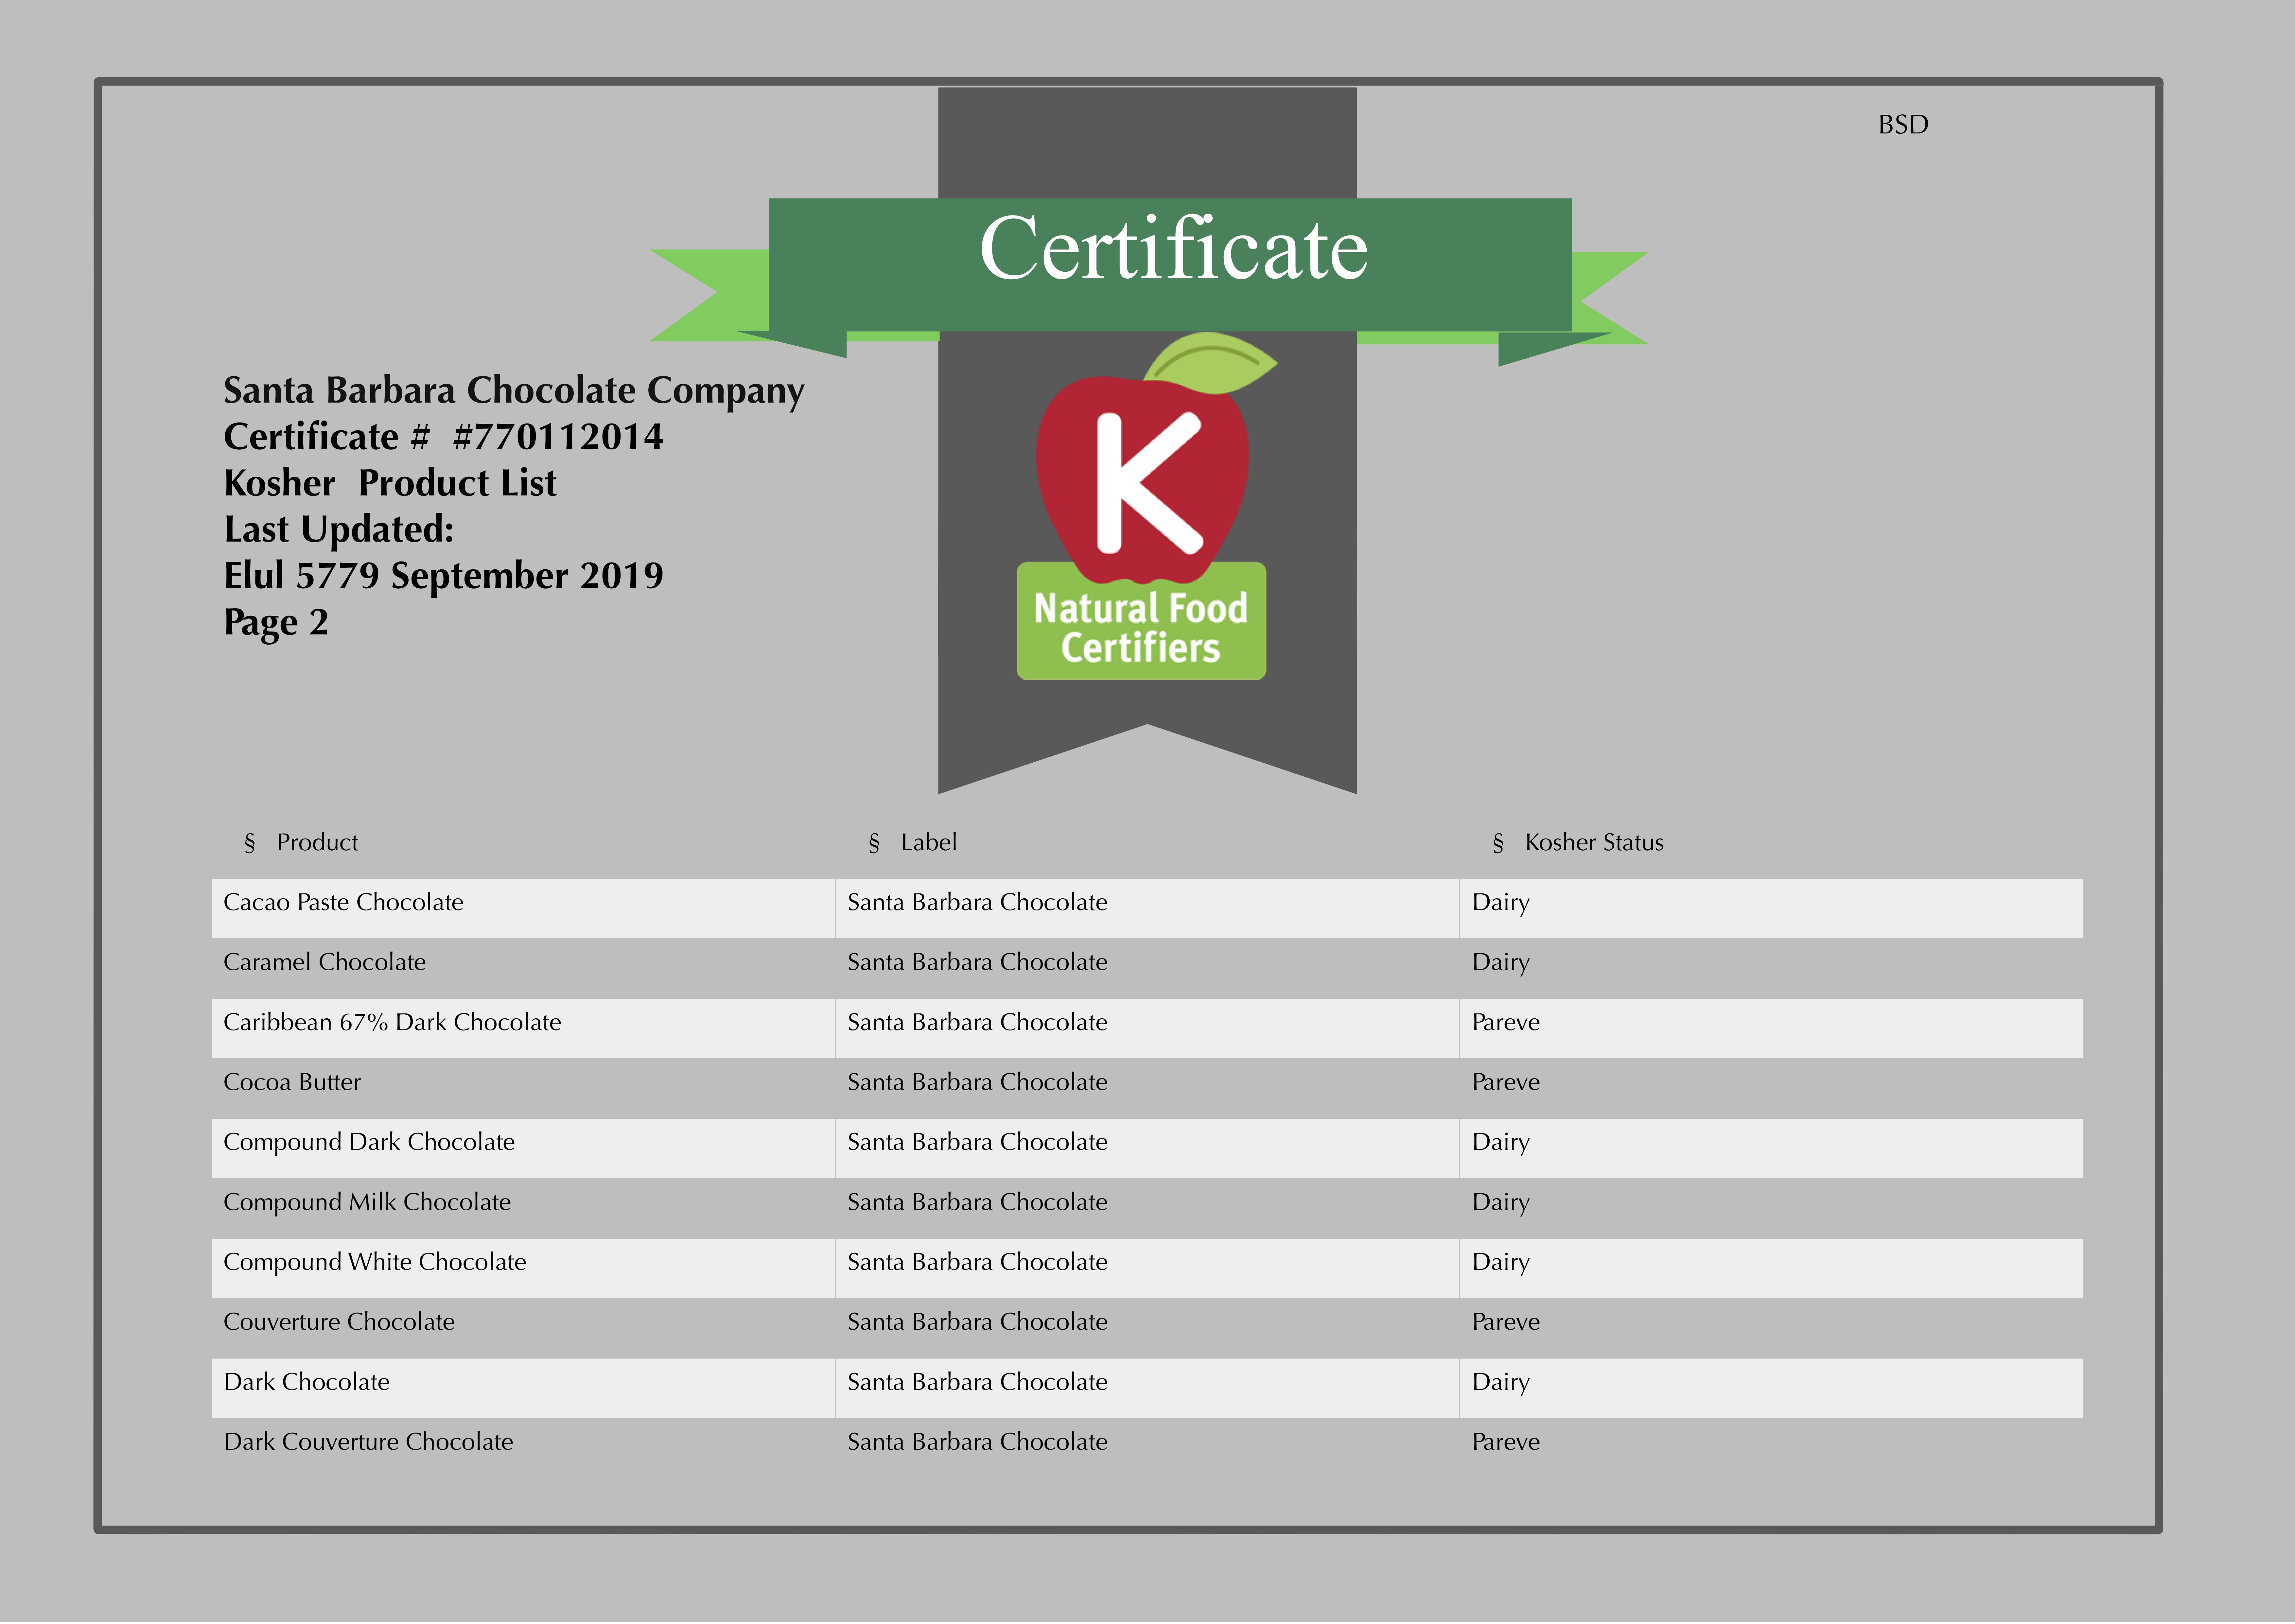 santa-barbara-chocolate-kosher-certificate-2019-2020-page-3.jpg